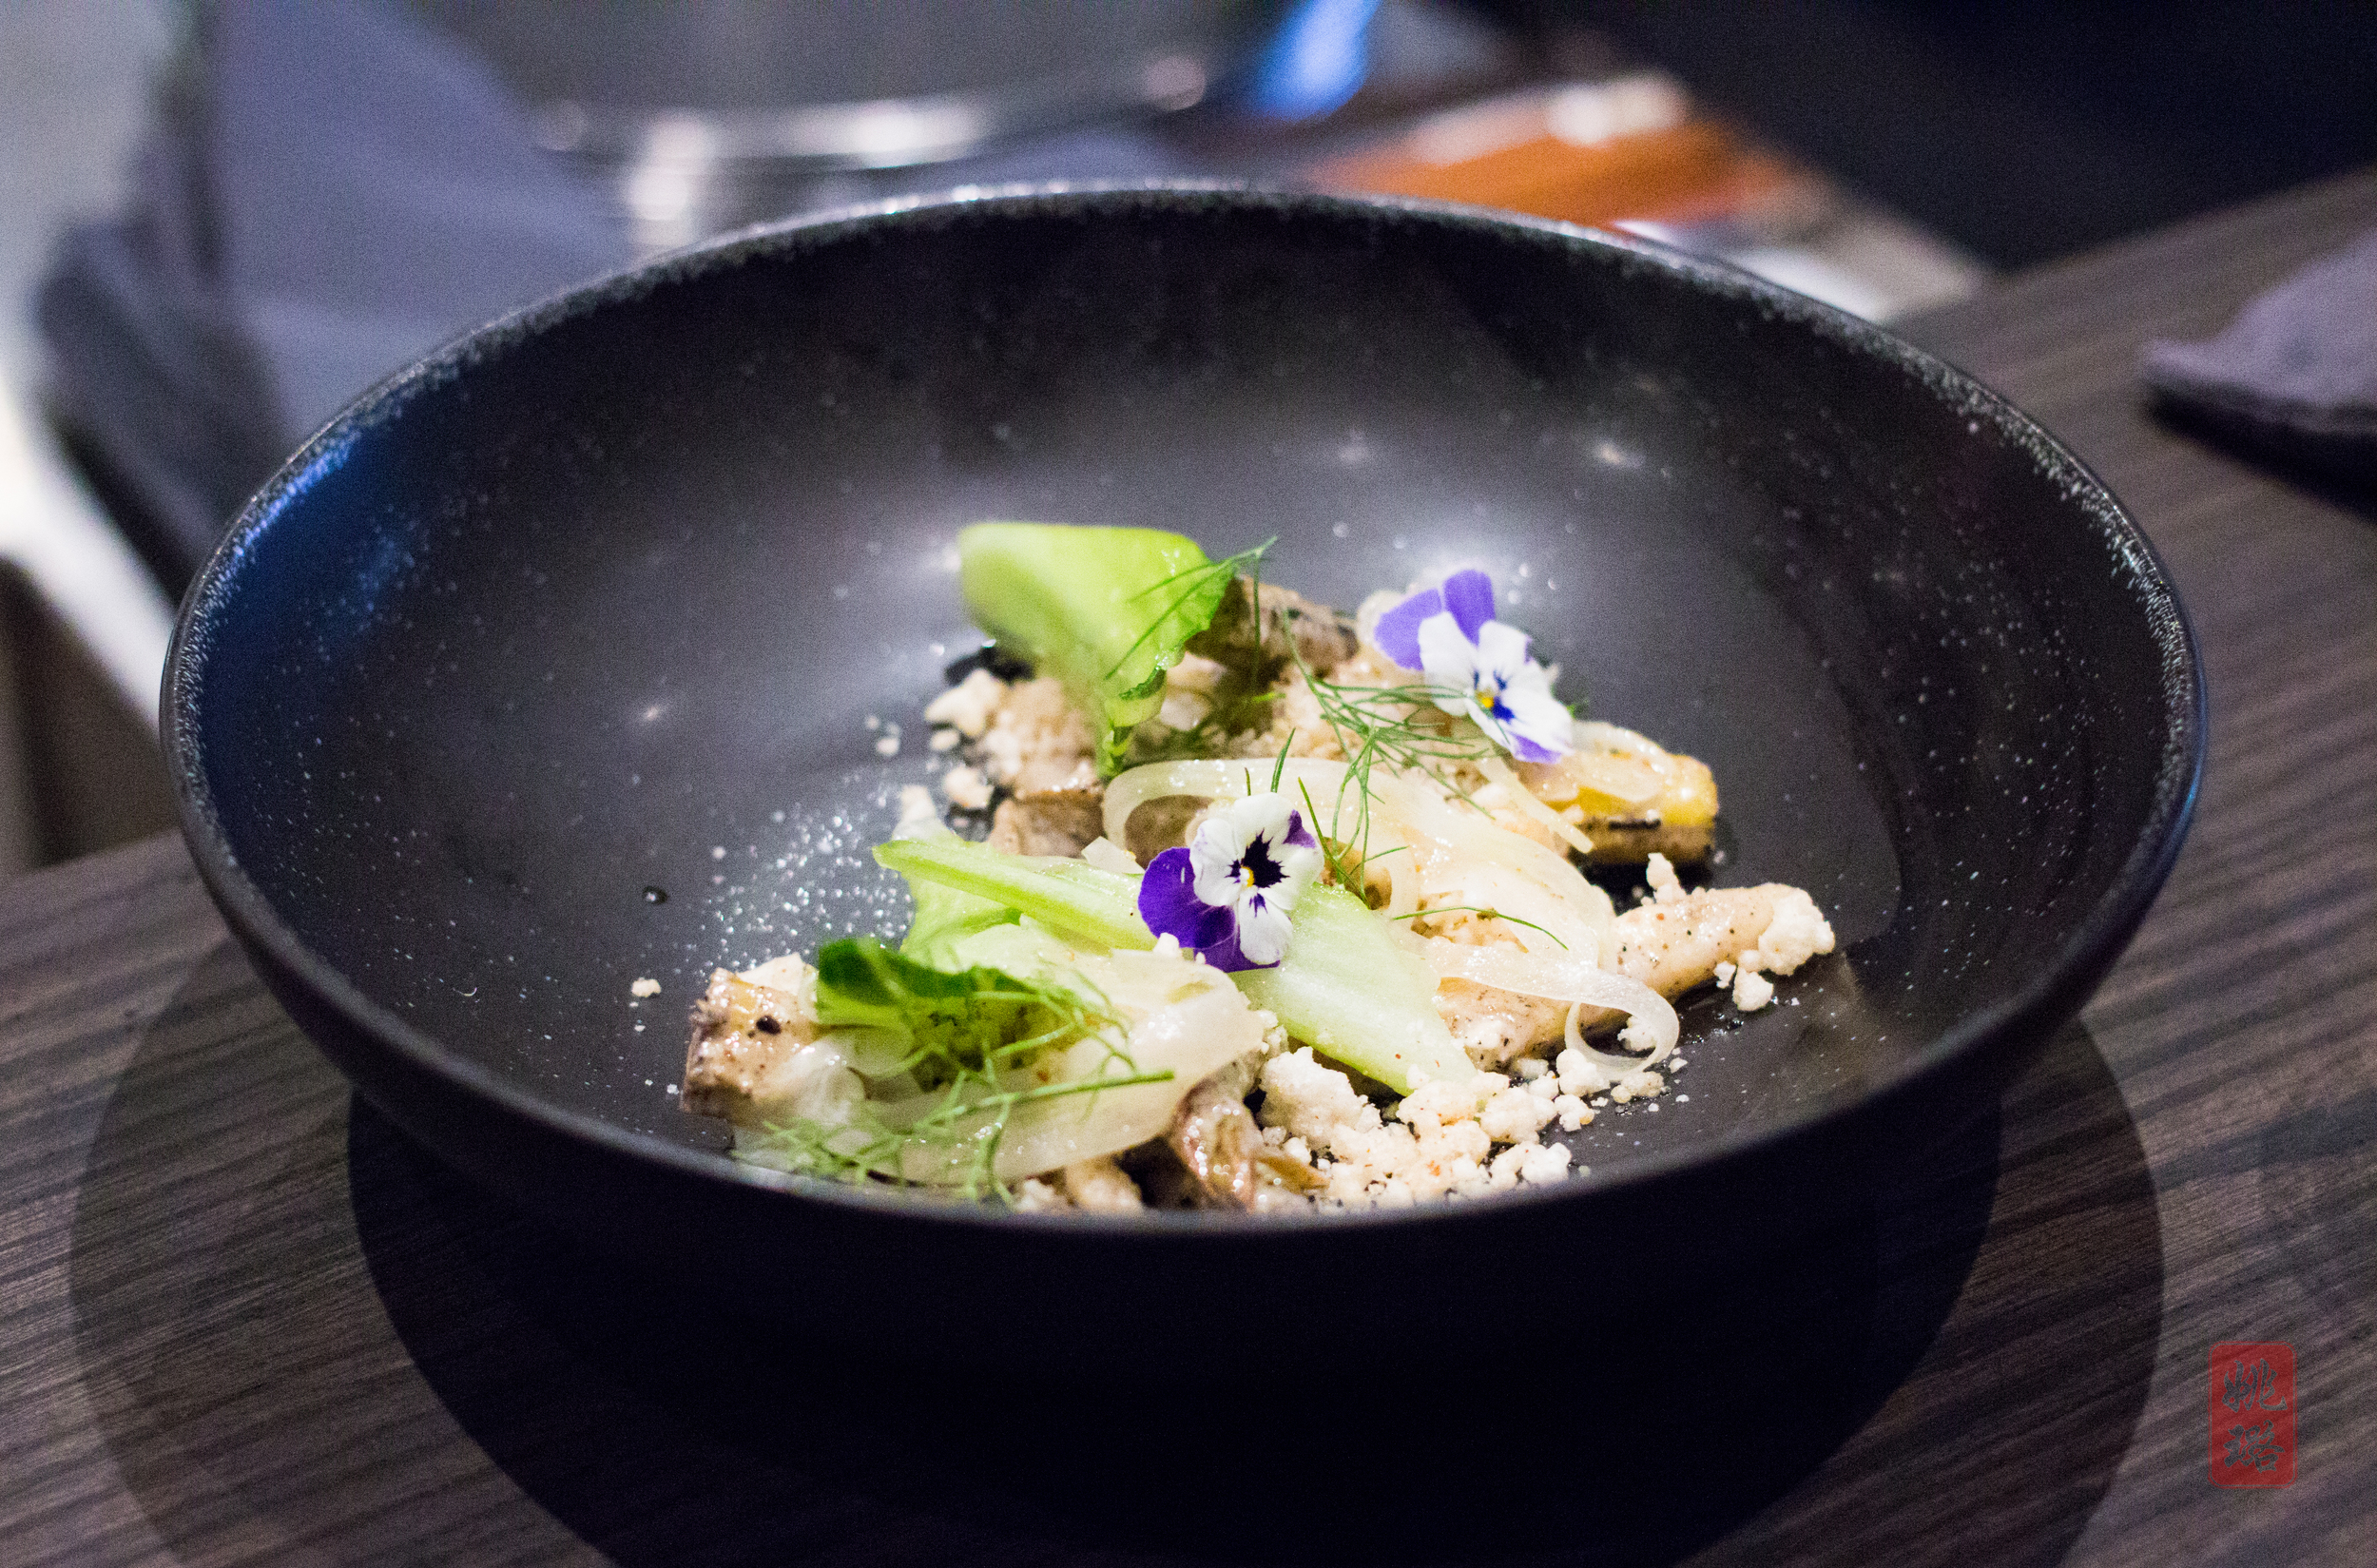 Grilled asparagus salad - macadamia nut dressing, fennel, rice